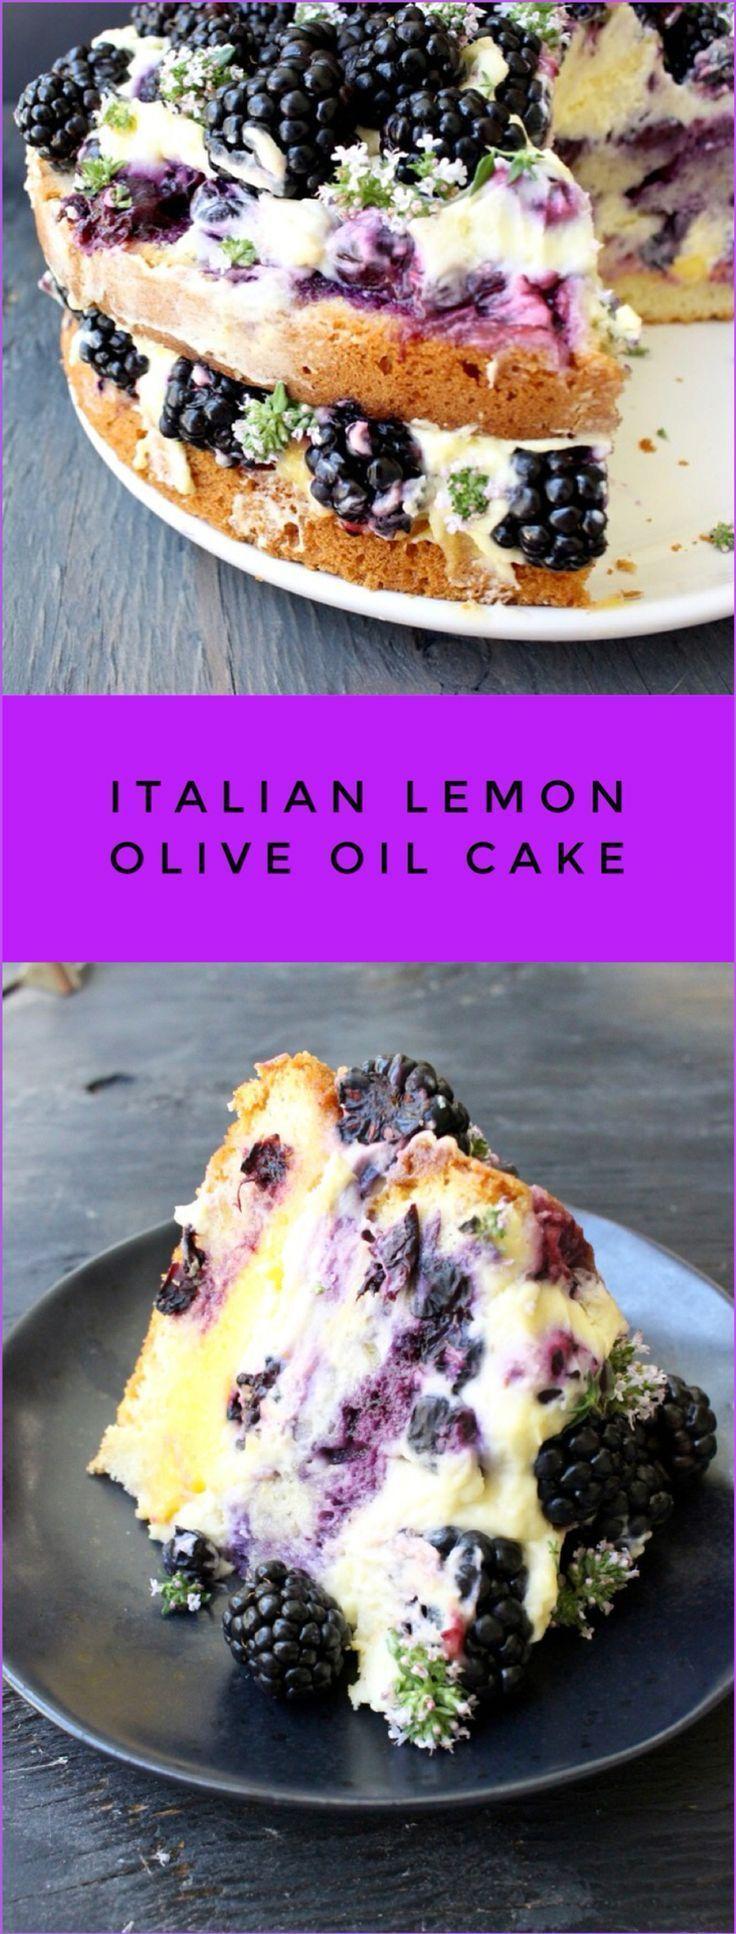 Italian Lemon Olive Oil Cake Recipe with Berries & Mascarpone • CiaoFlorentina